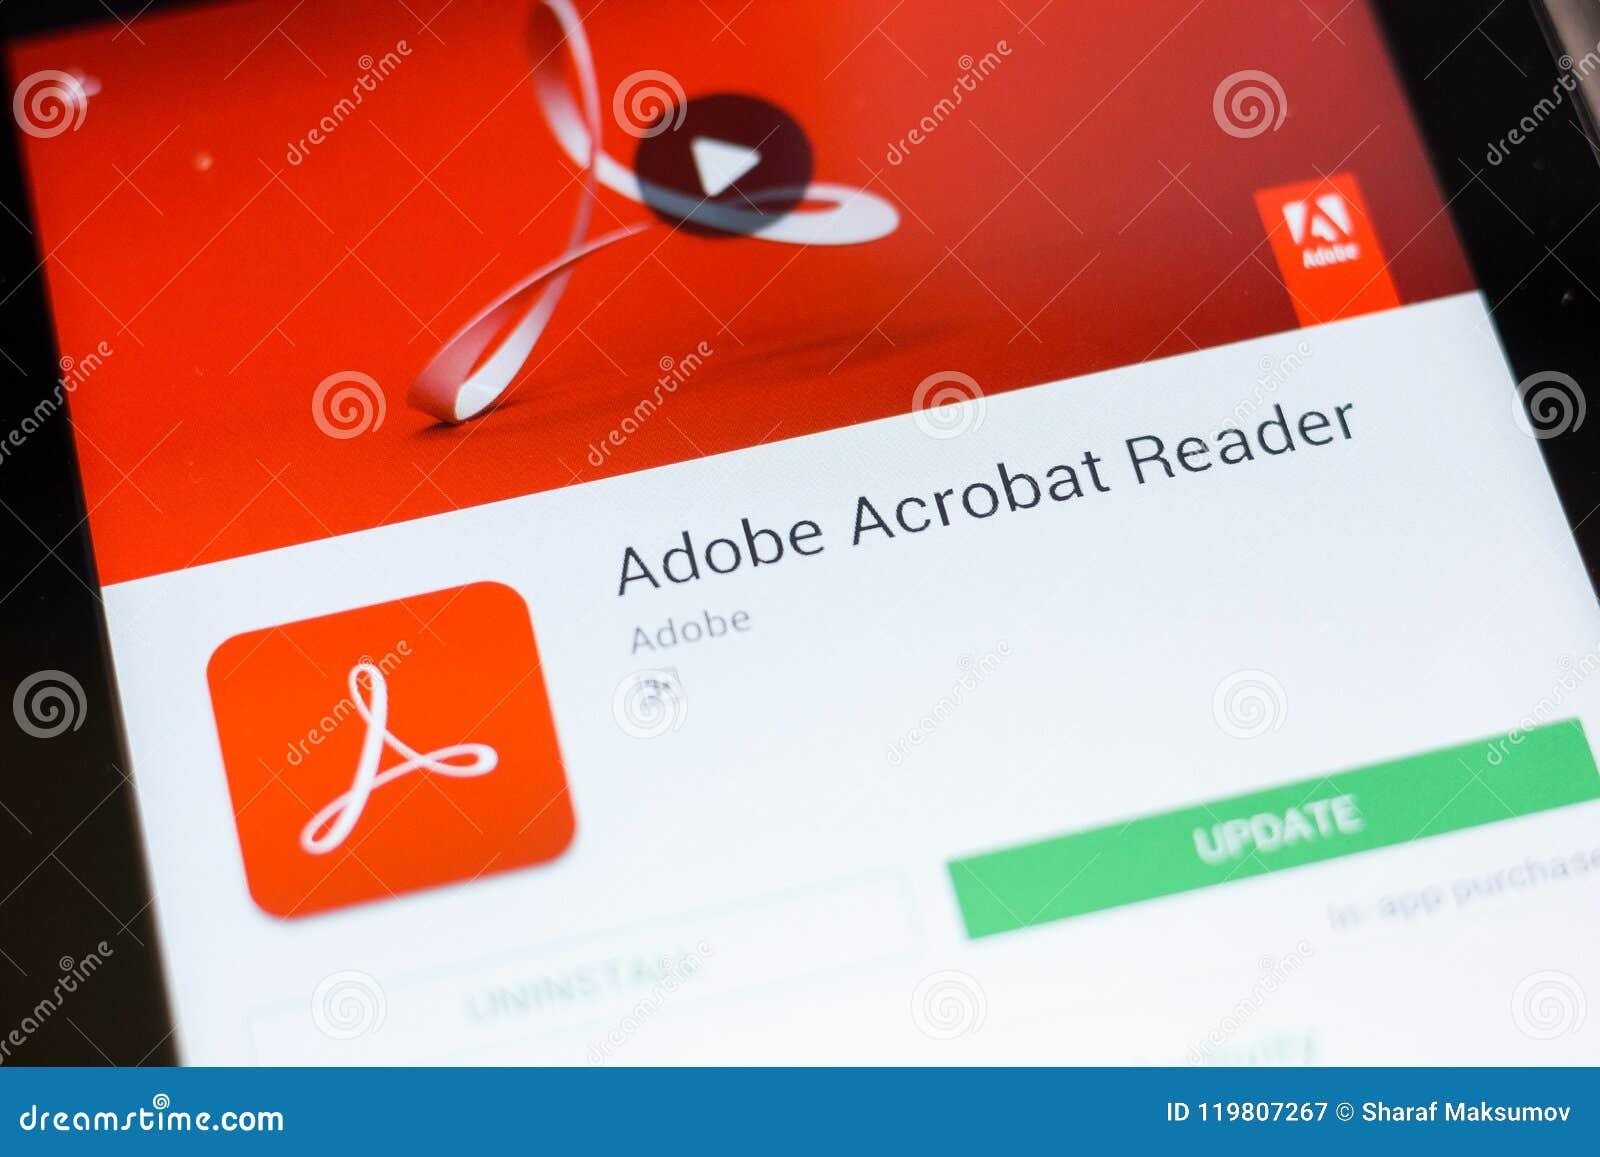 adobe acrobat reader download for pc